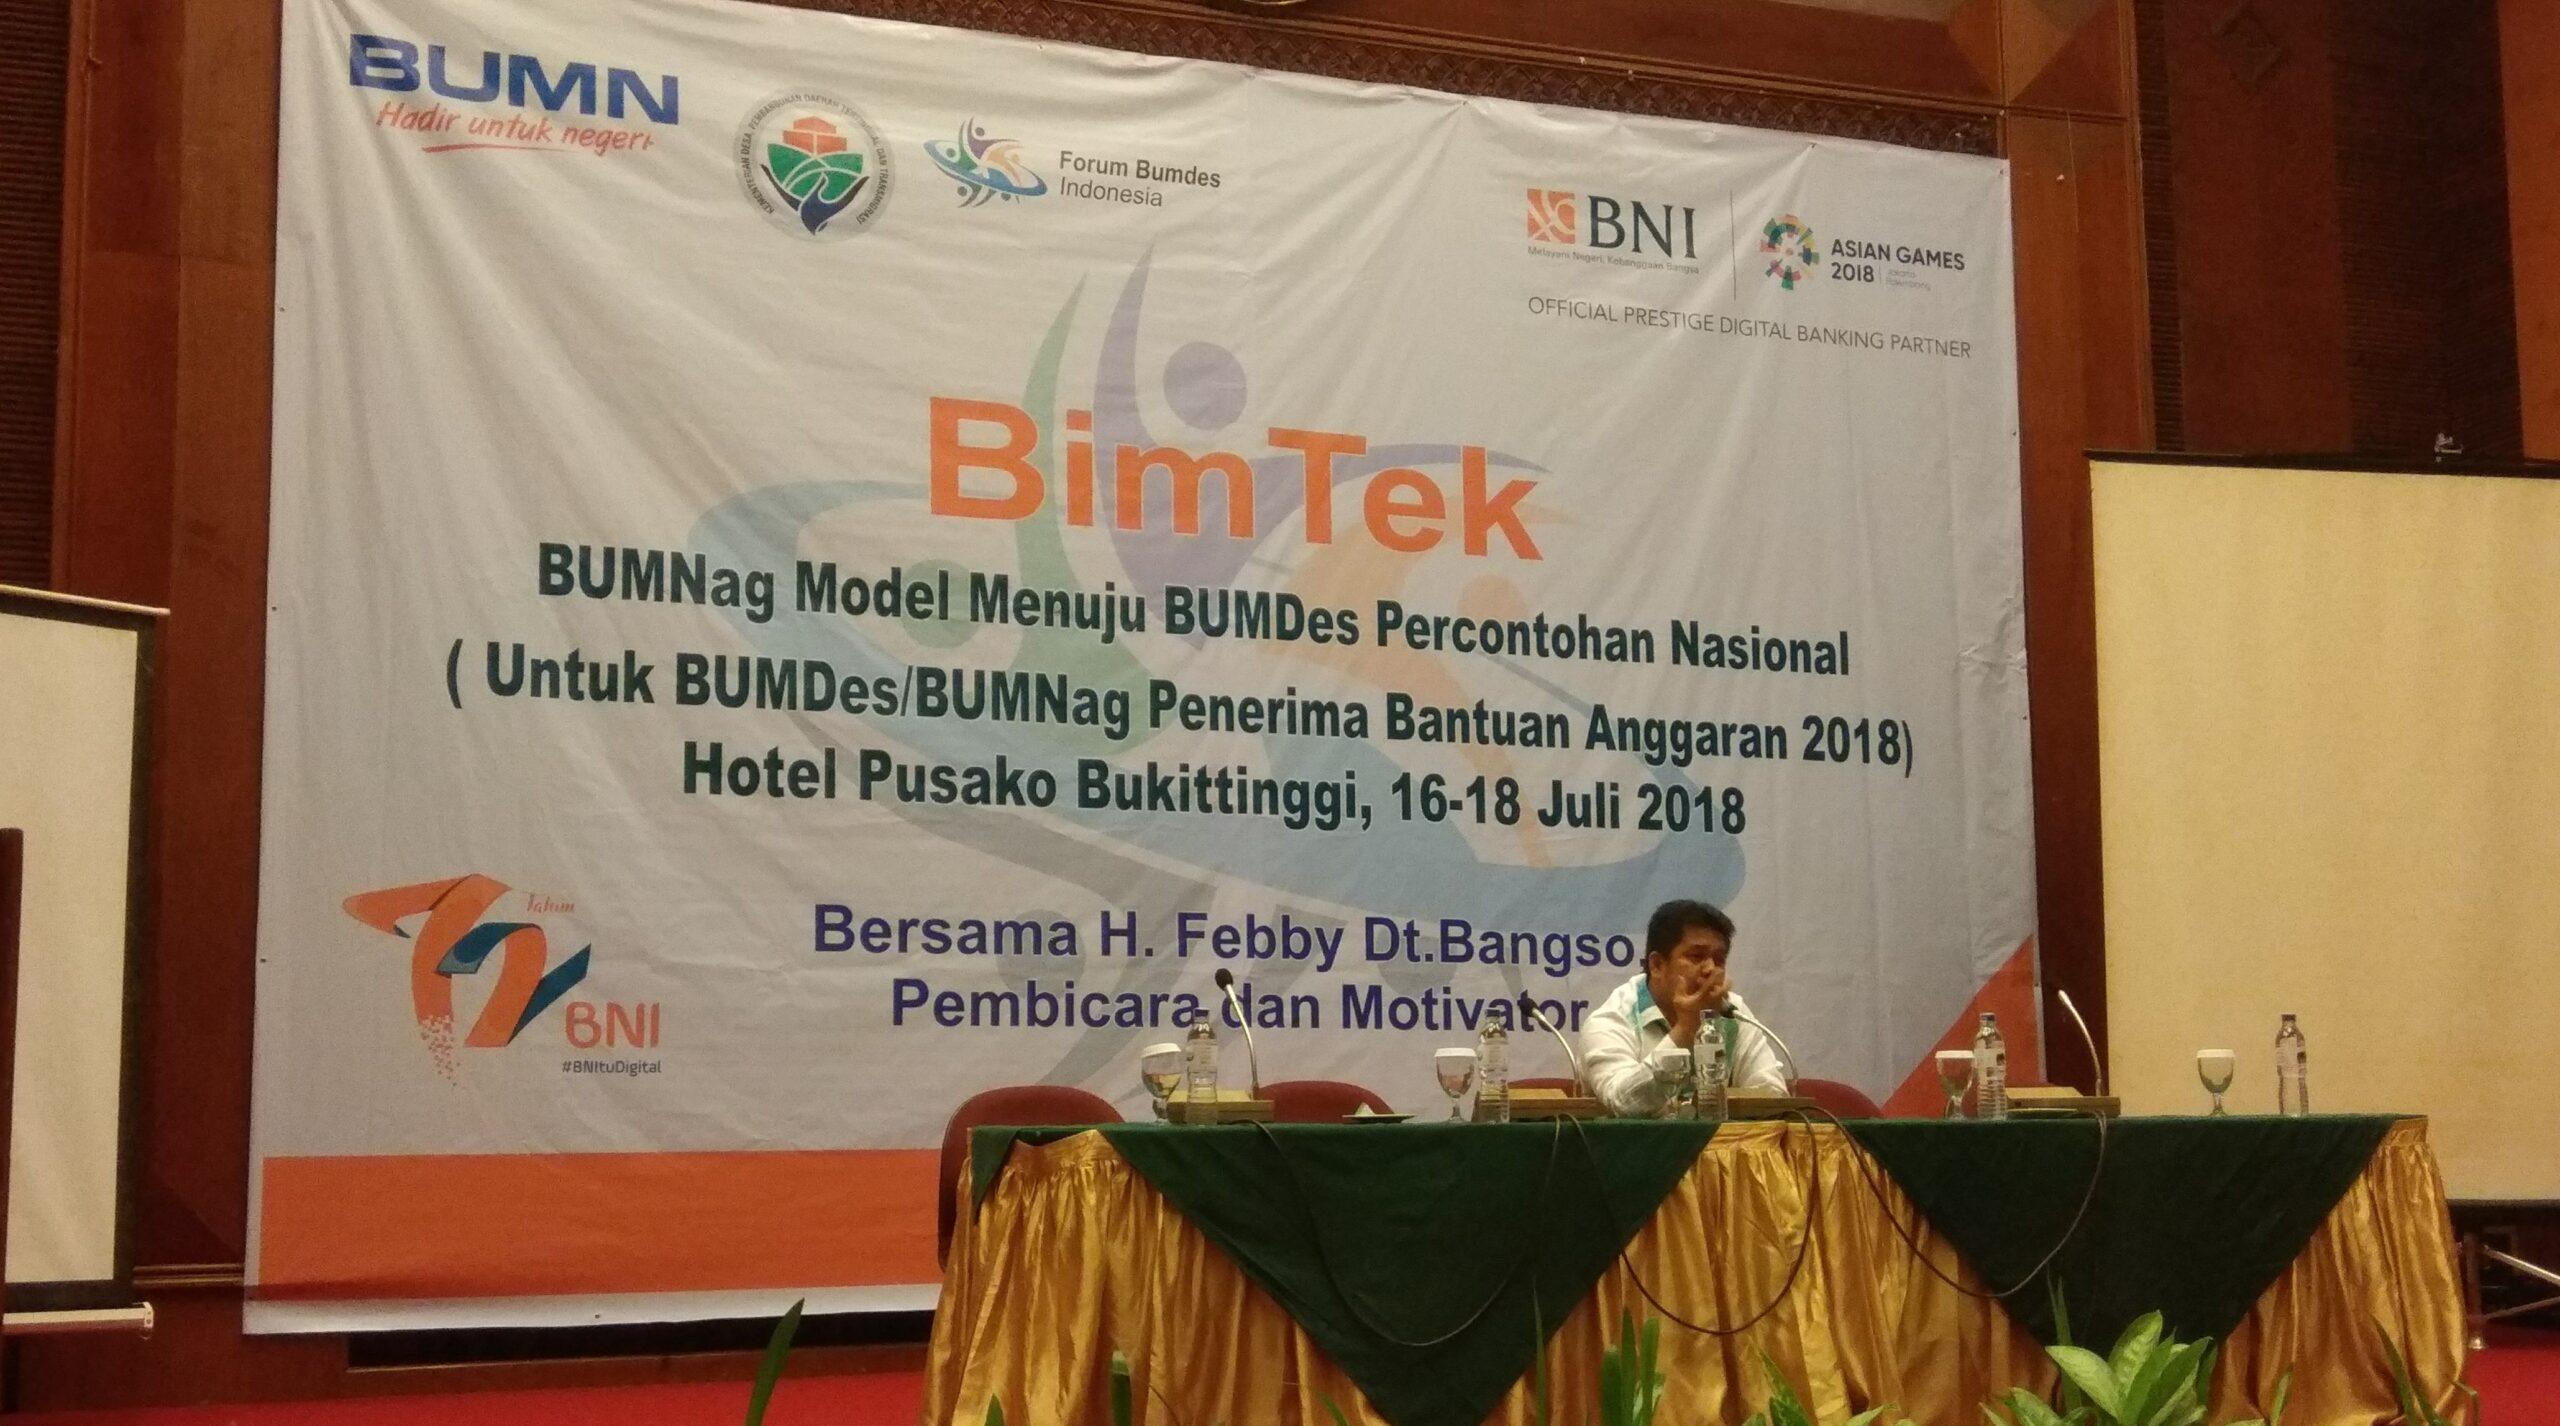 Ketua Forum Bumdes Indonesia, Febby Dt Bangso memberikan motivasi kepada pengurus Bumnag se-Sumbar. Foto : Hijrah Adi Sukrial